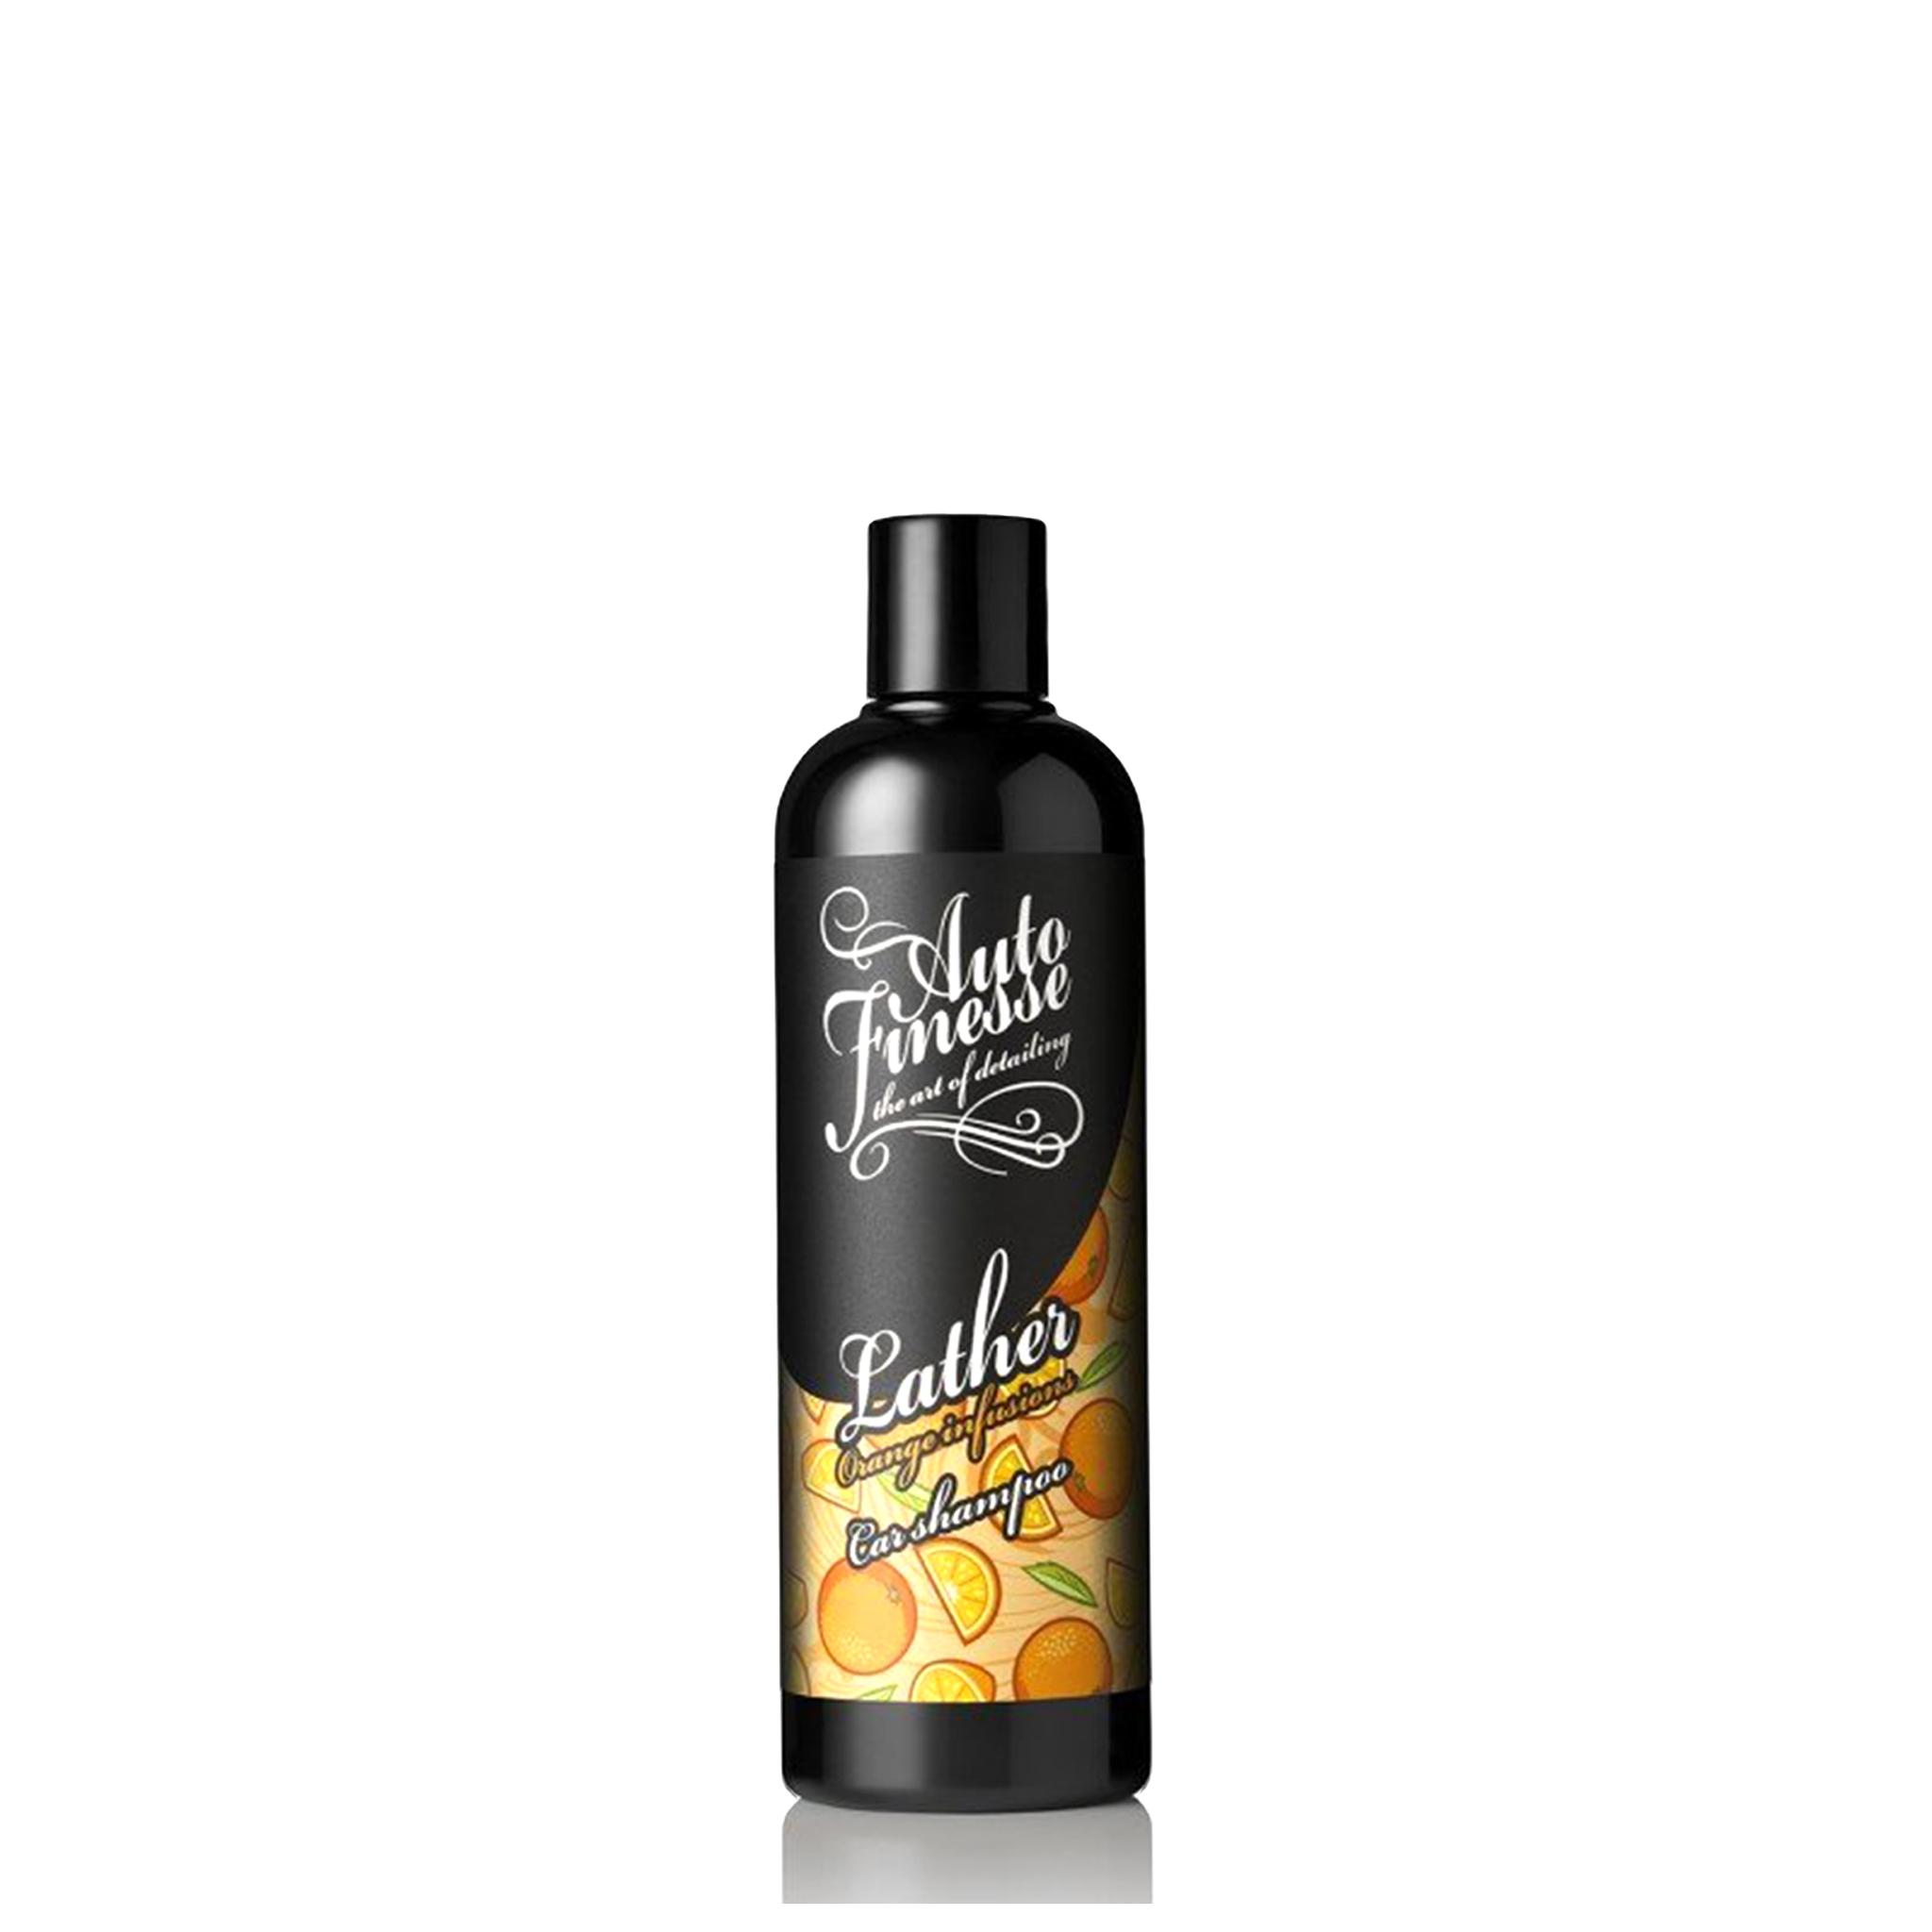 Bilschampo Auto Finesse Lather Orange, 500 ml